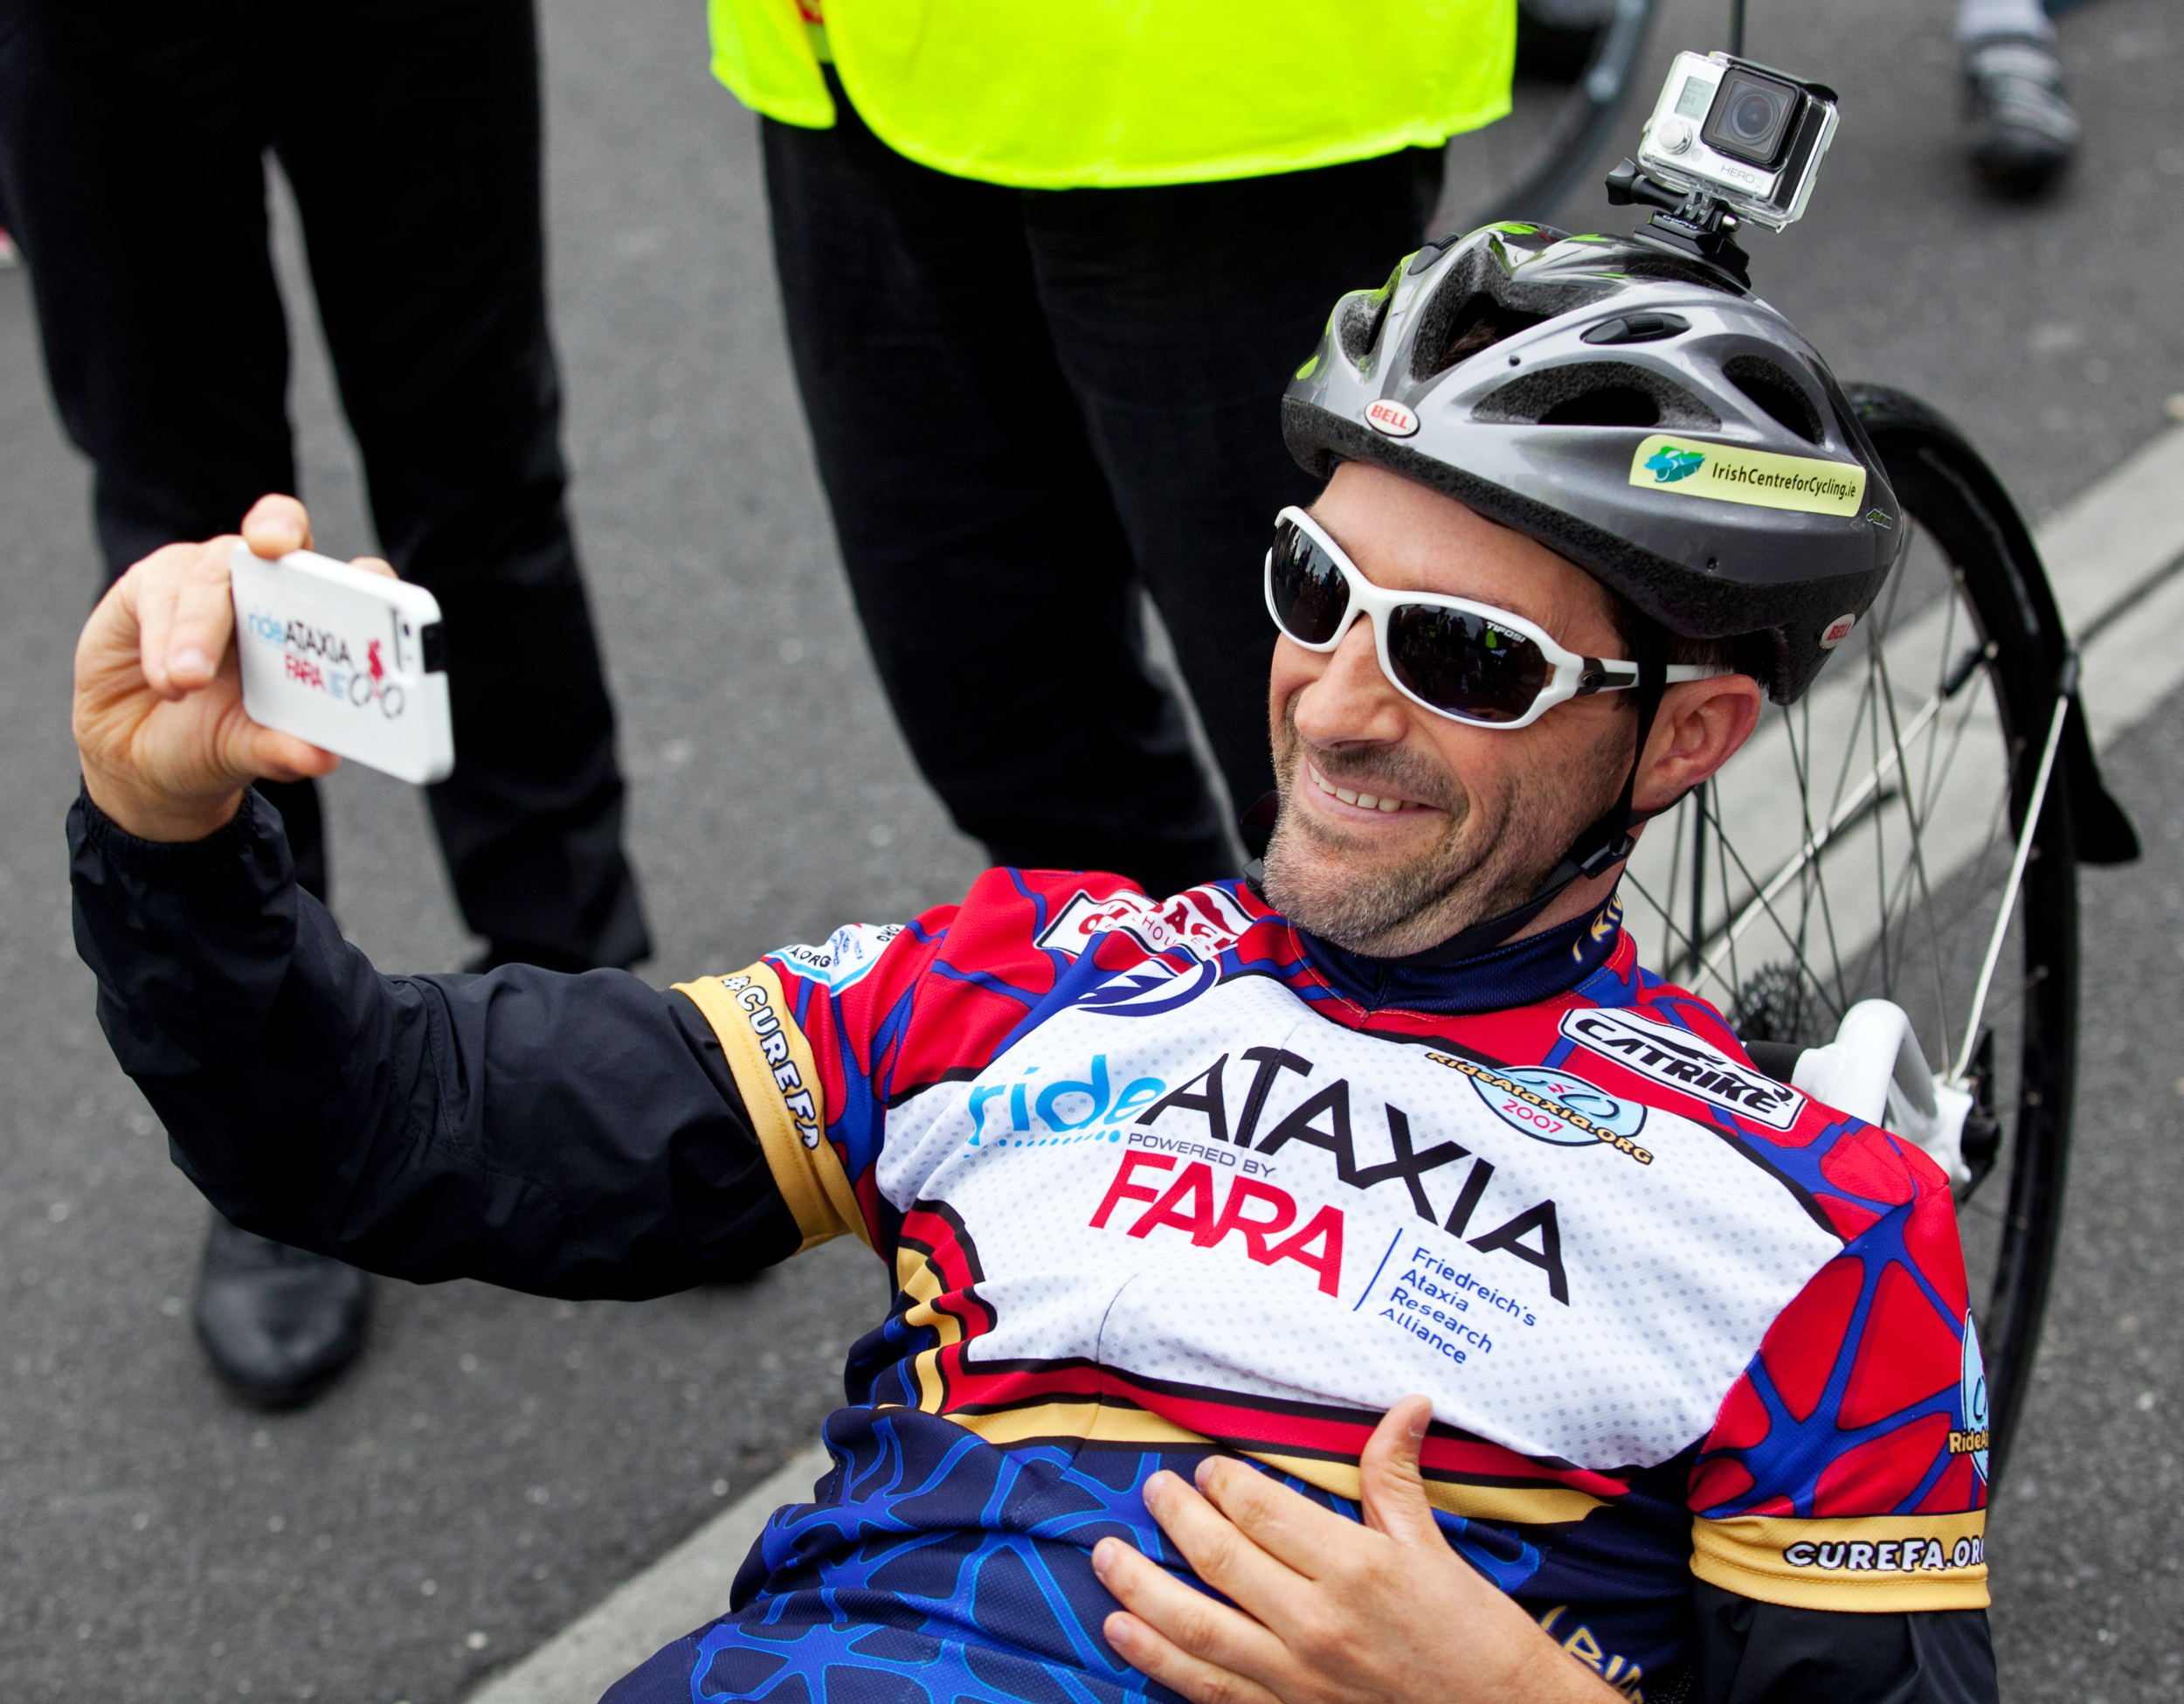 036_CycleAtaxia2015.jpg